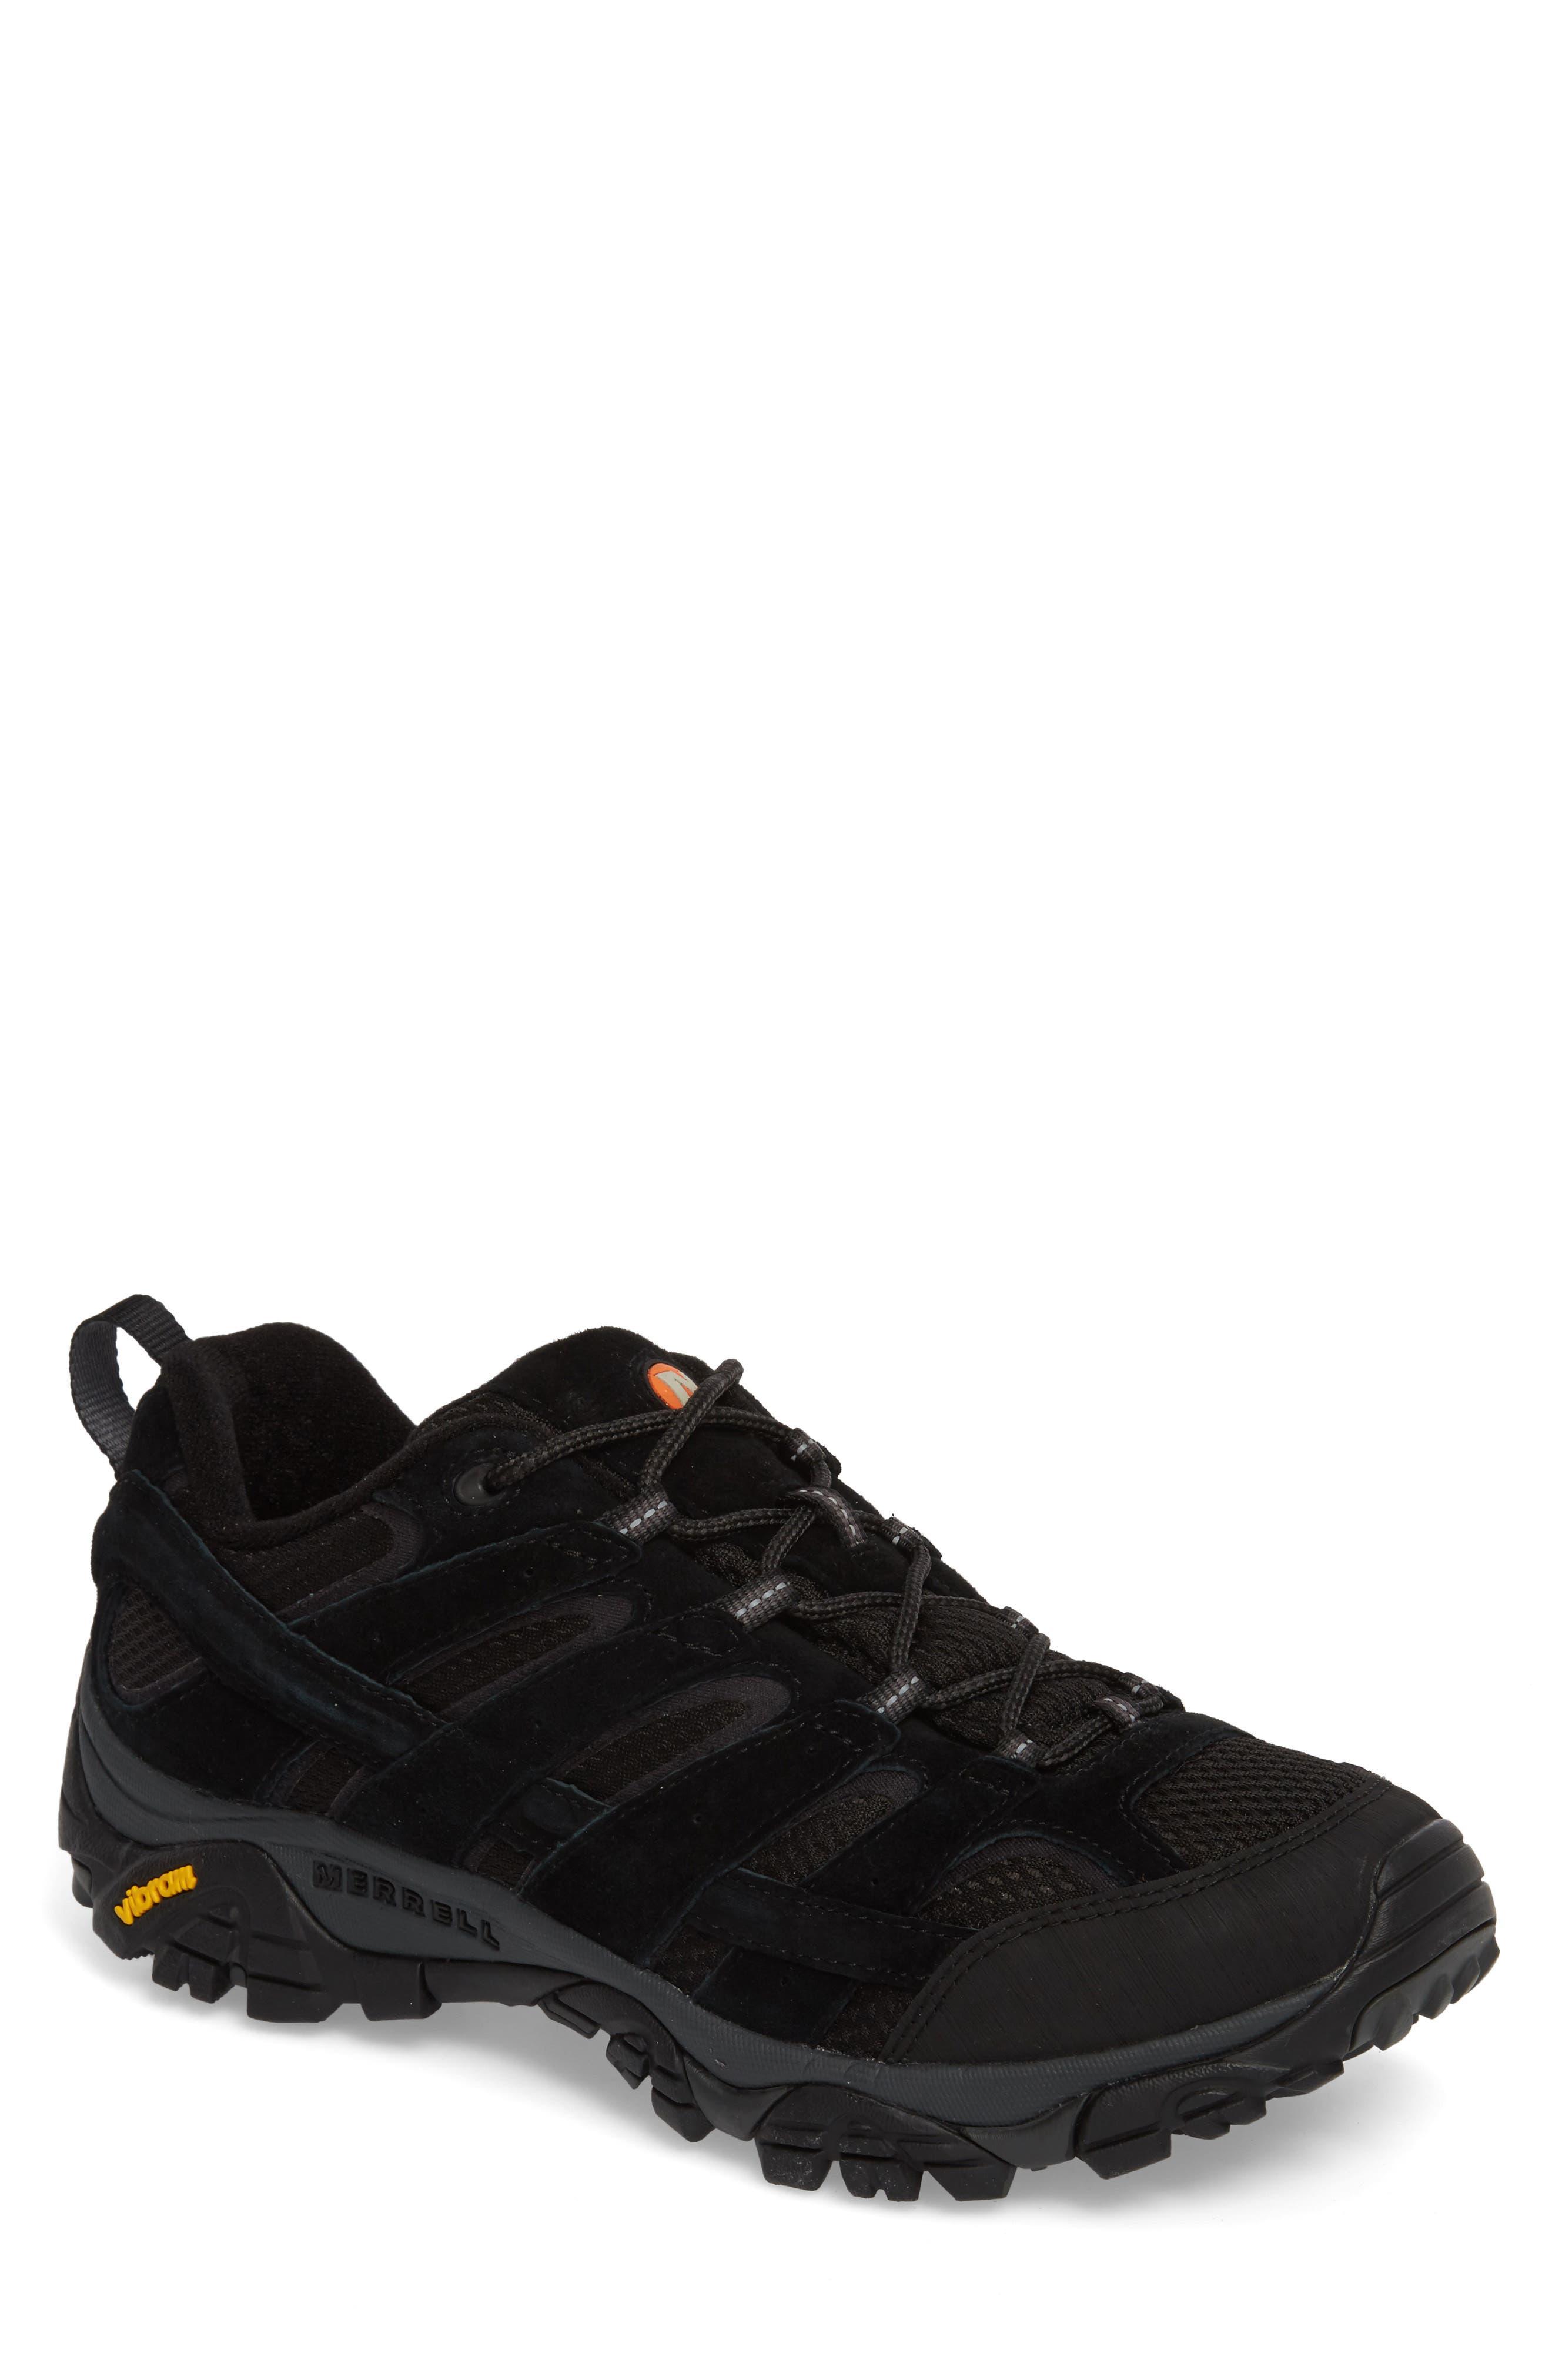 b89d21a8312a2f Men s Hiking Sneakers